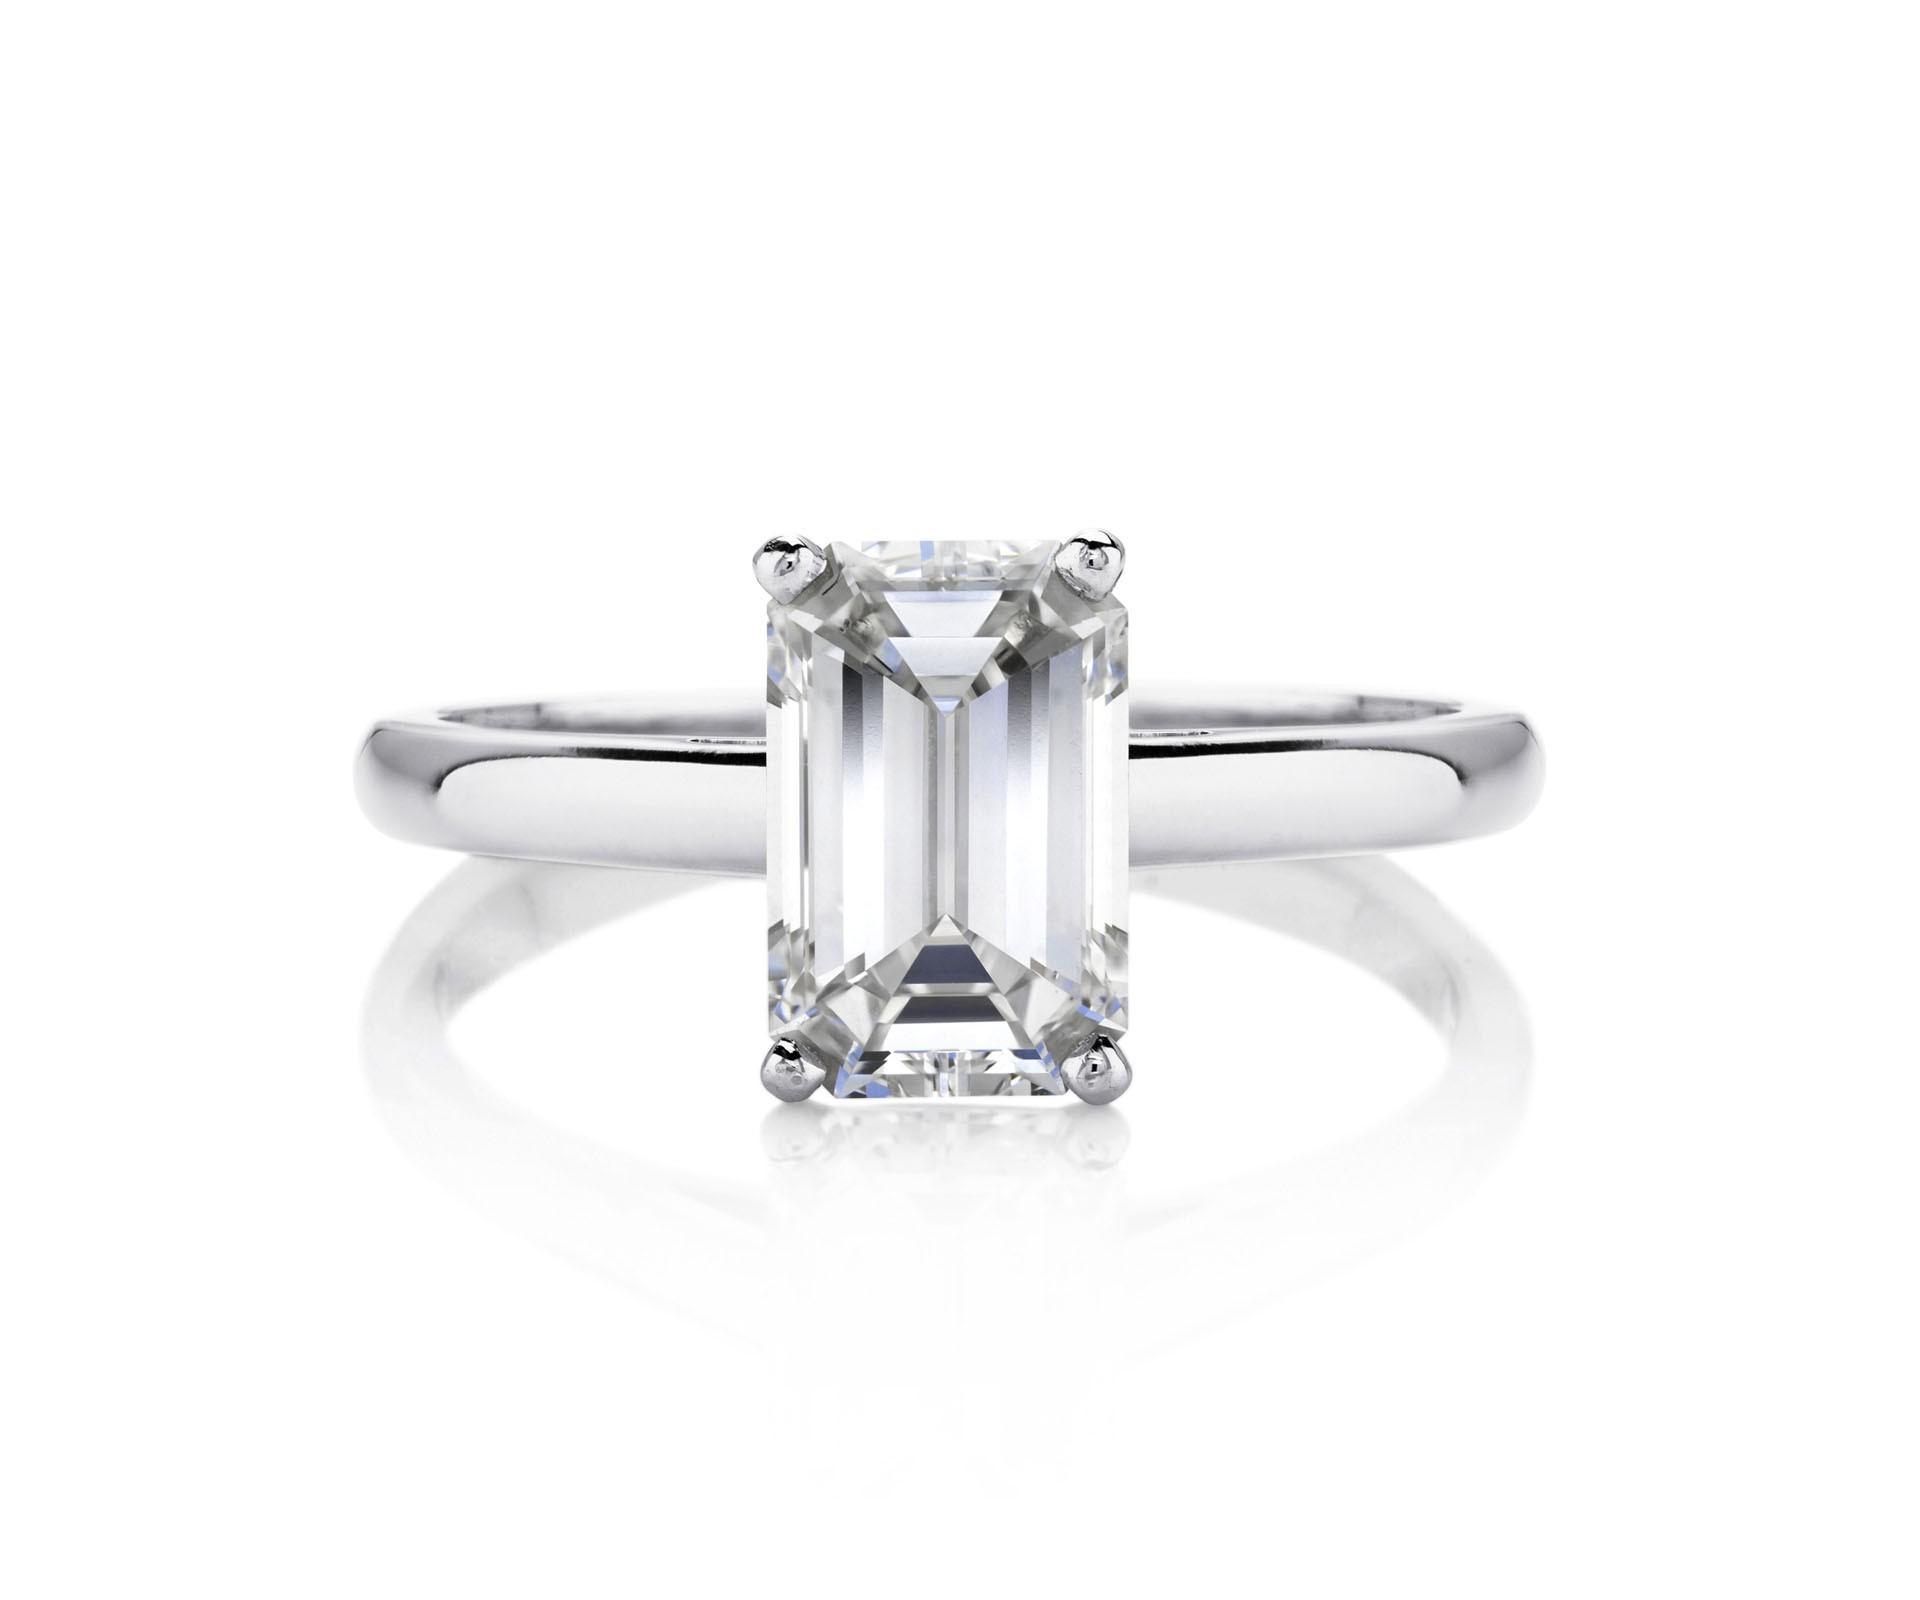 1.54ct Diamond D VVS1 IGI Certified Lab Grown CVD Emerald BRILLIANT CUT TYPE2A